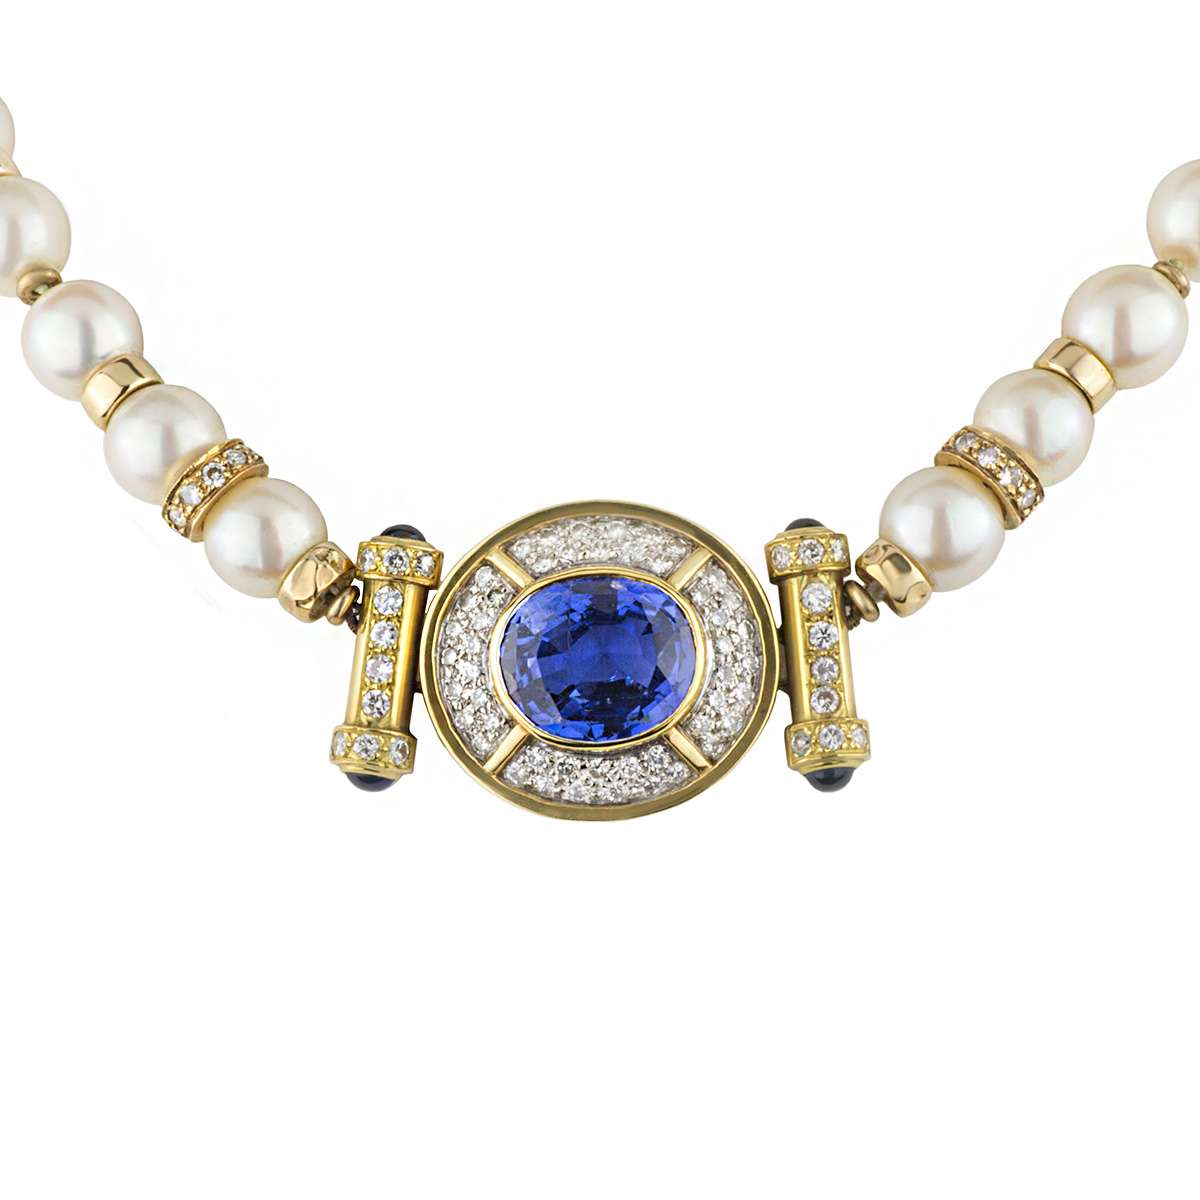 18k Yellow Gold Sapphire, Pearl & Diamond Choker?